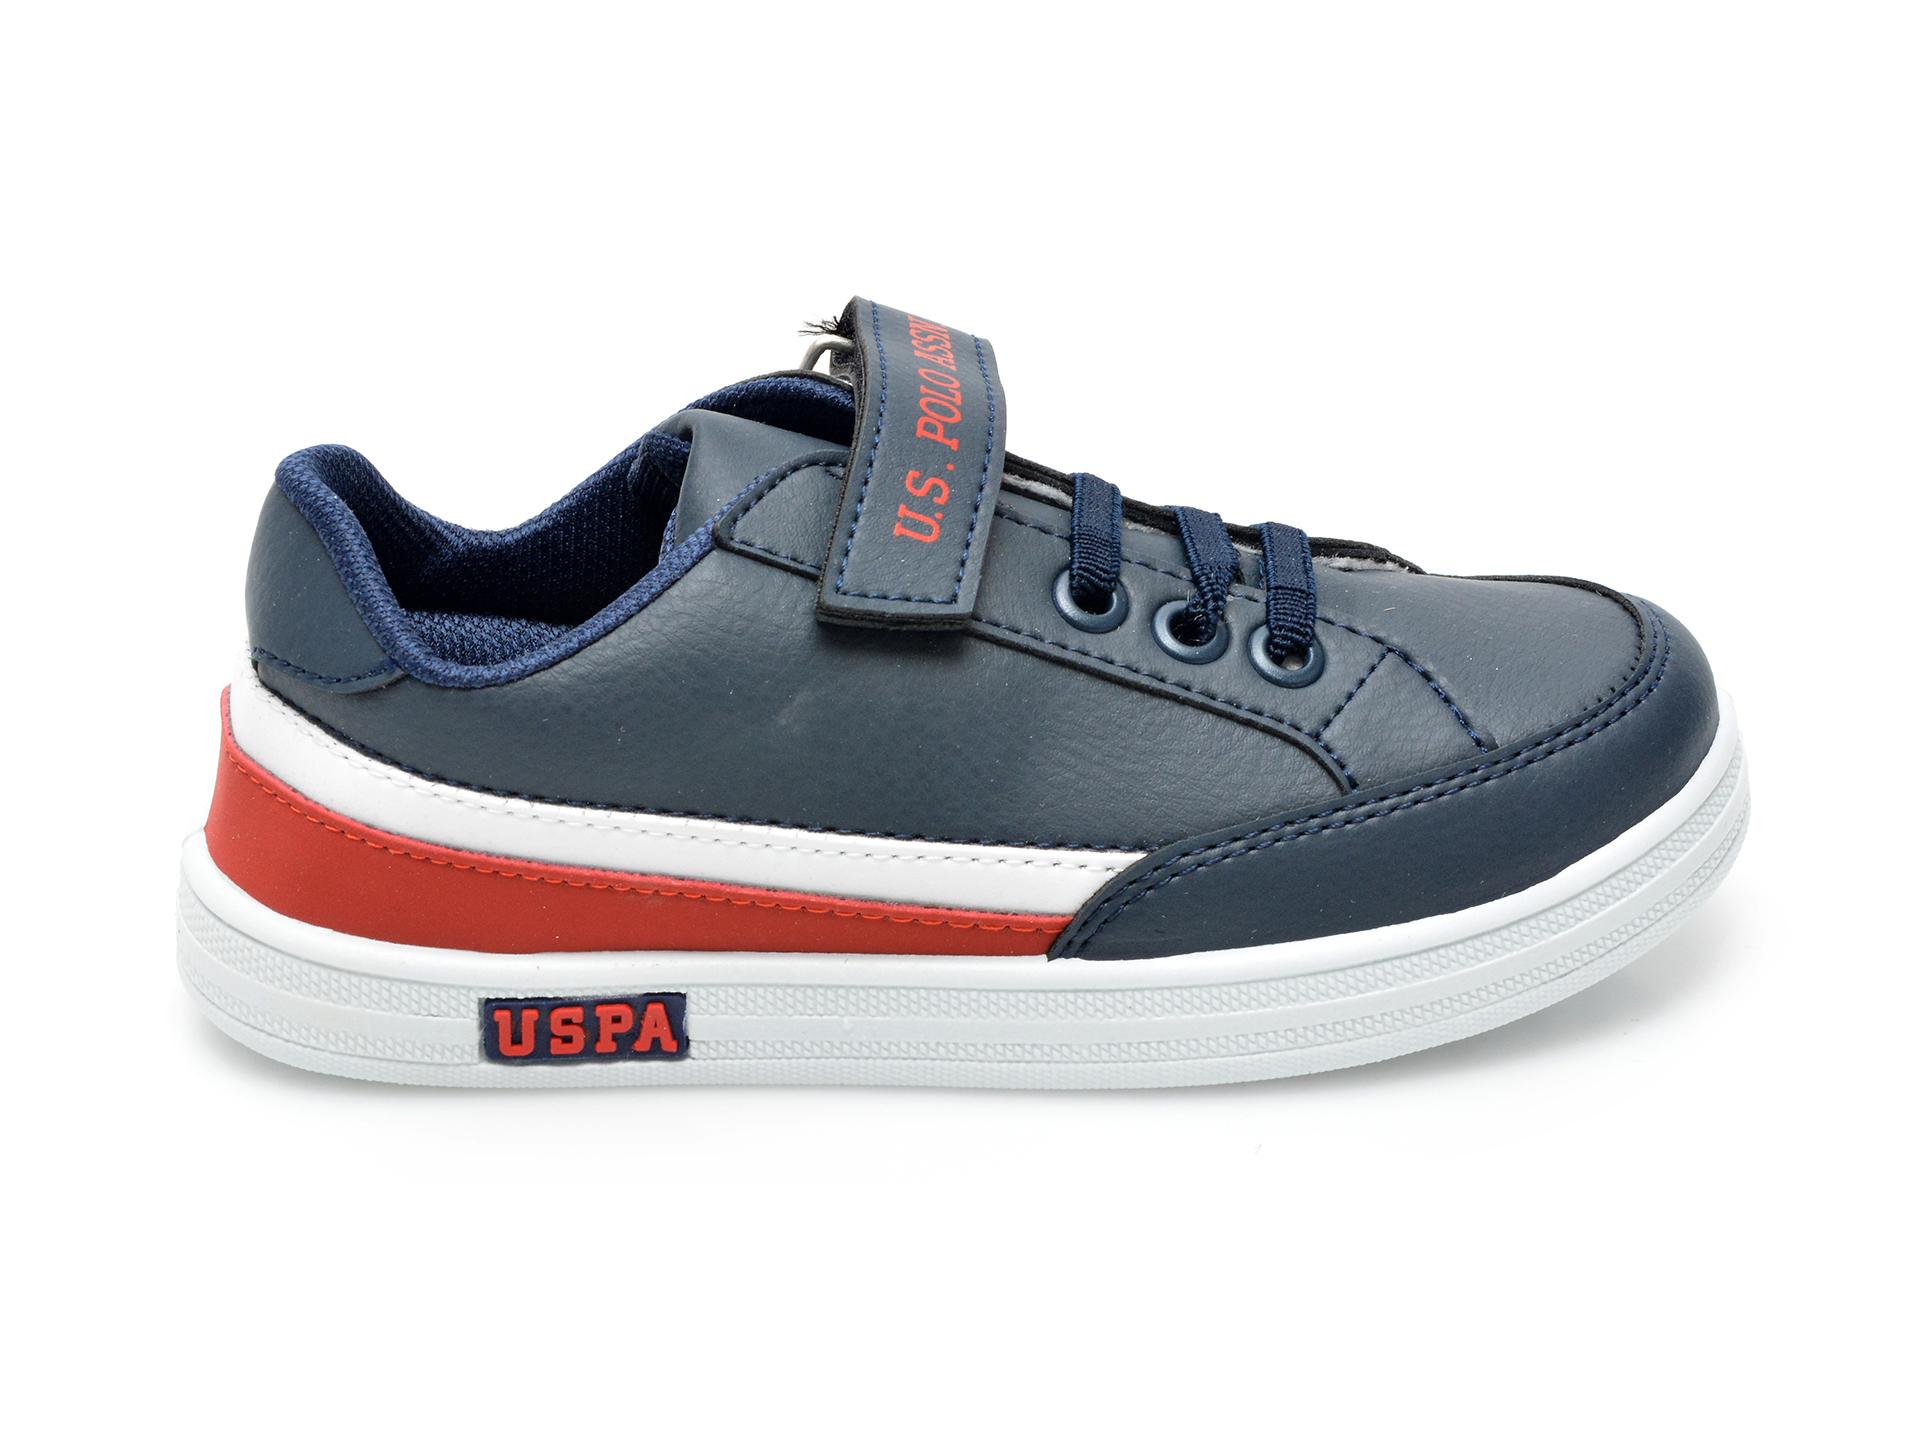 Pantofi sport US POLO ASSN bleumarin, JAMA1FX, din piele ecologica - 1